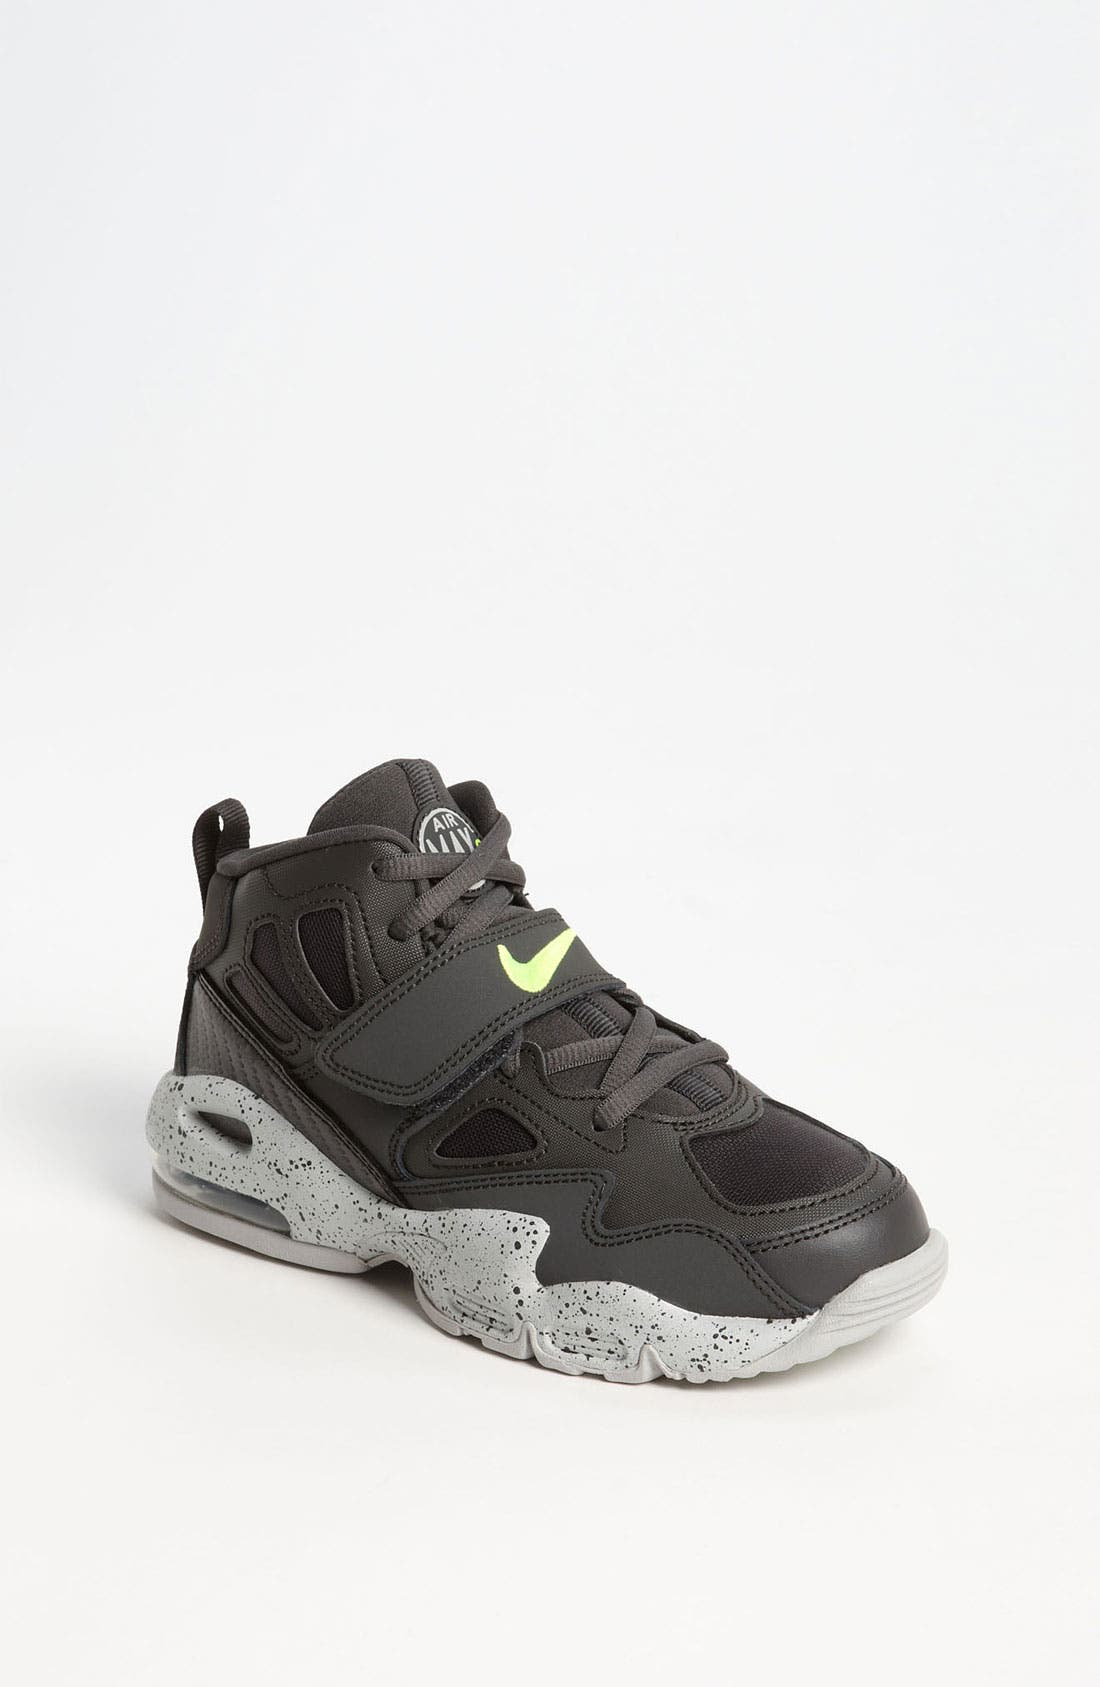 Alternate Image 1 Selected - Nike 'Air Max Express' Sneaker (Toddler, Little Kid & Big Kid)